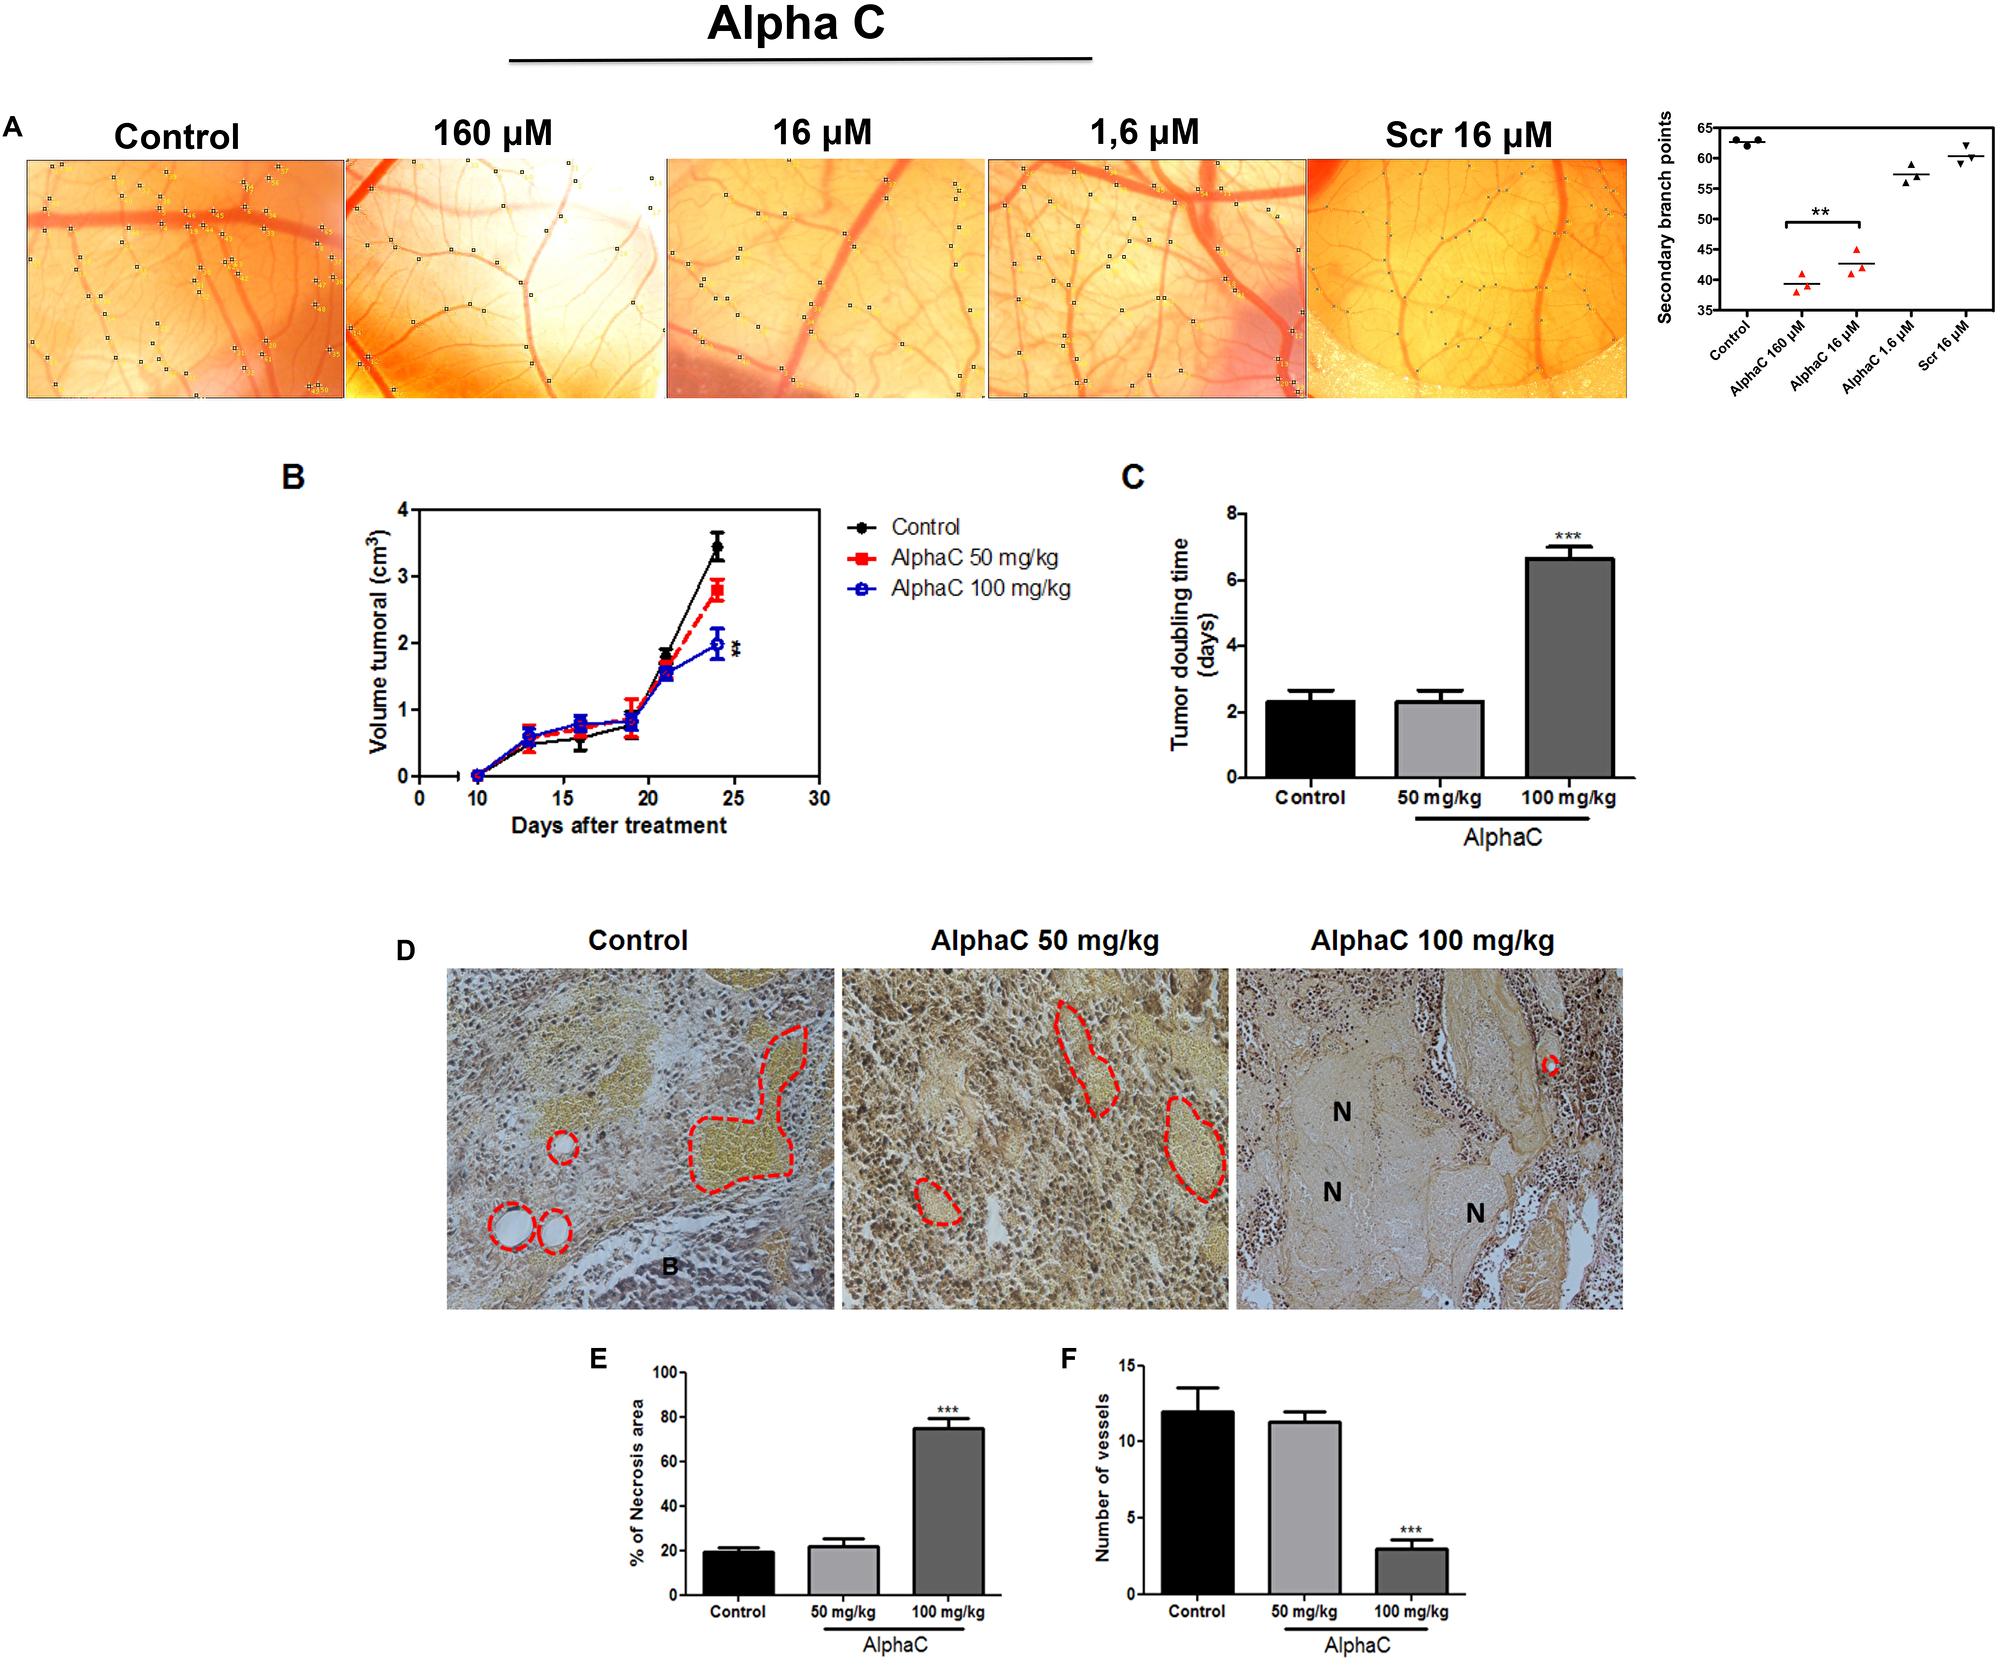 Alphastatin-C inhibits angiogenesis in vivo.